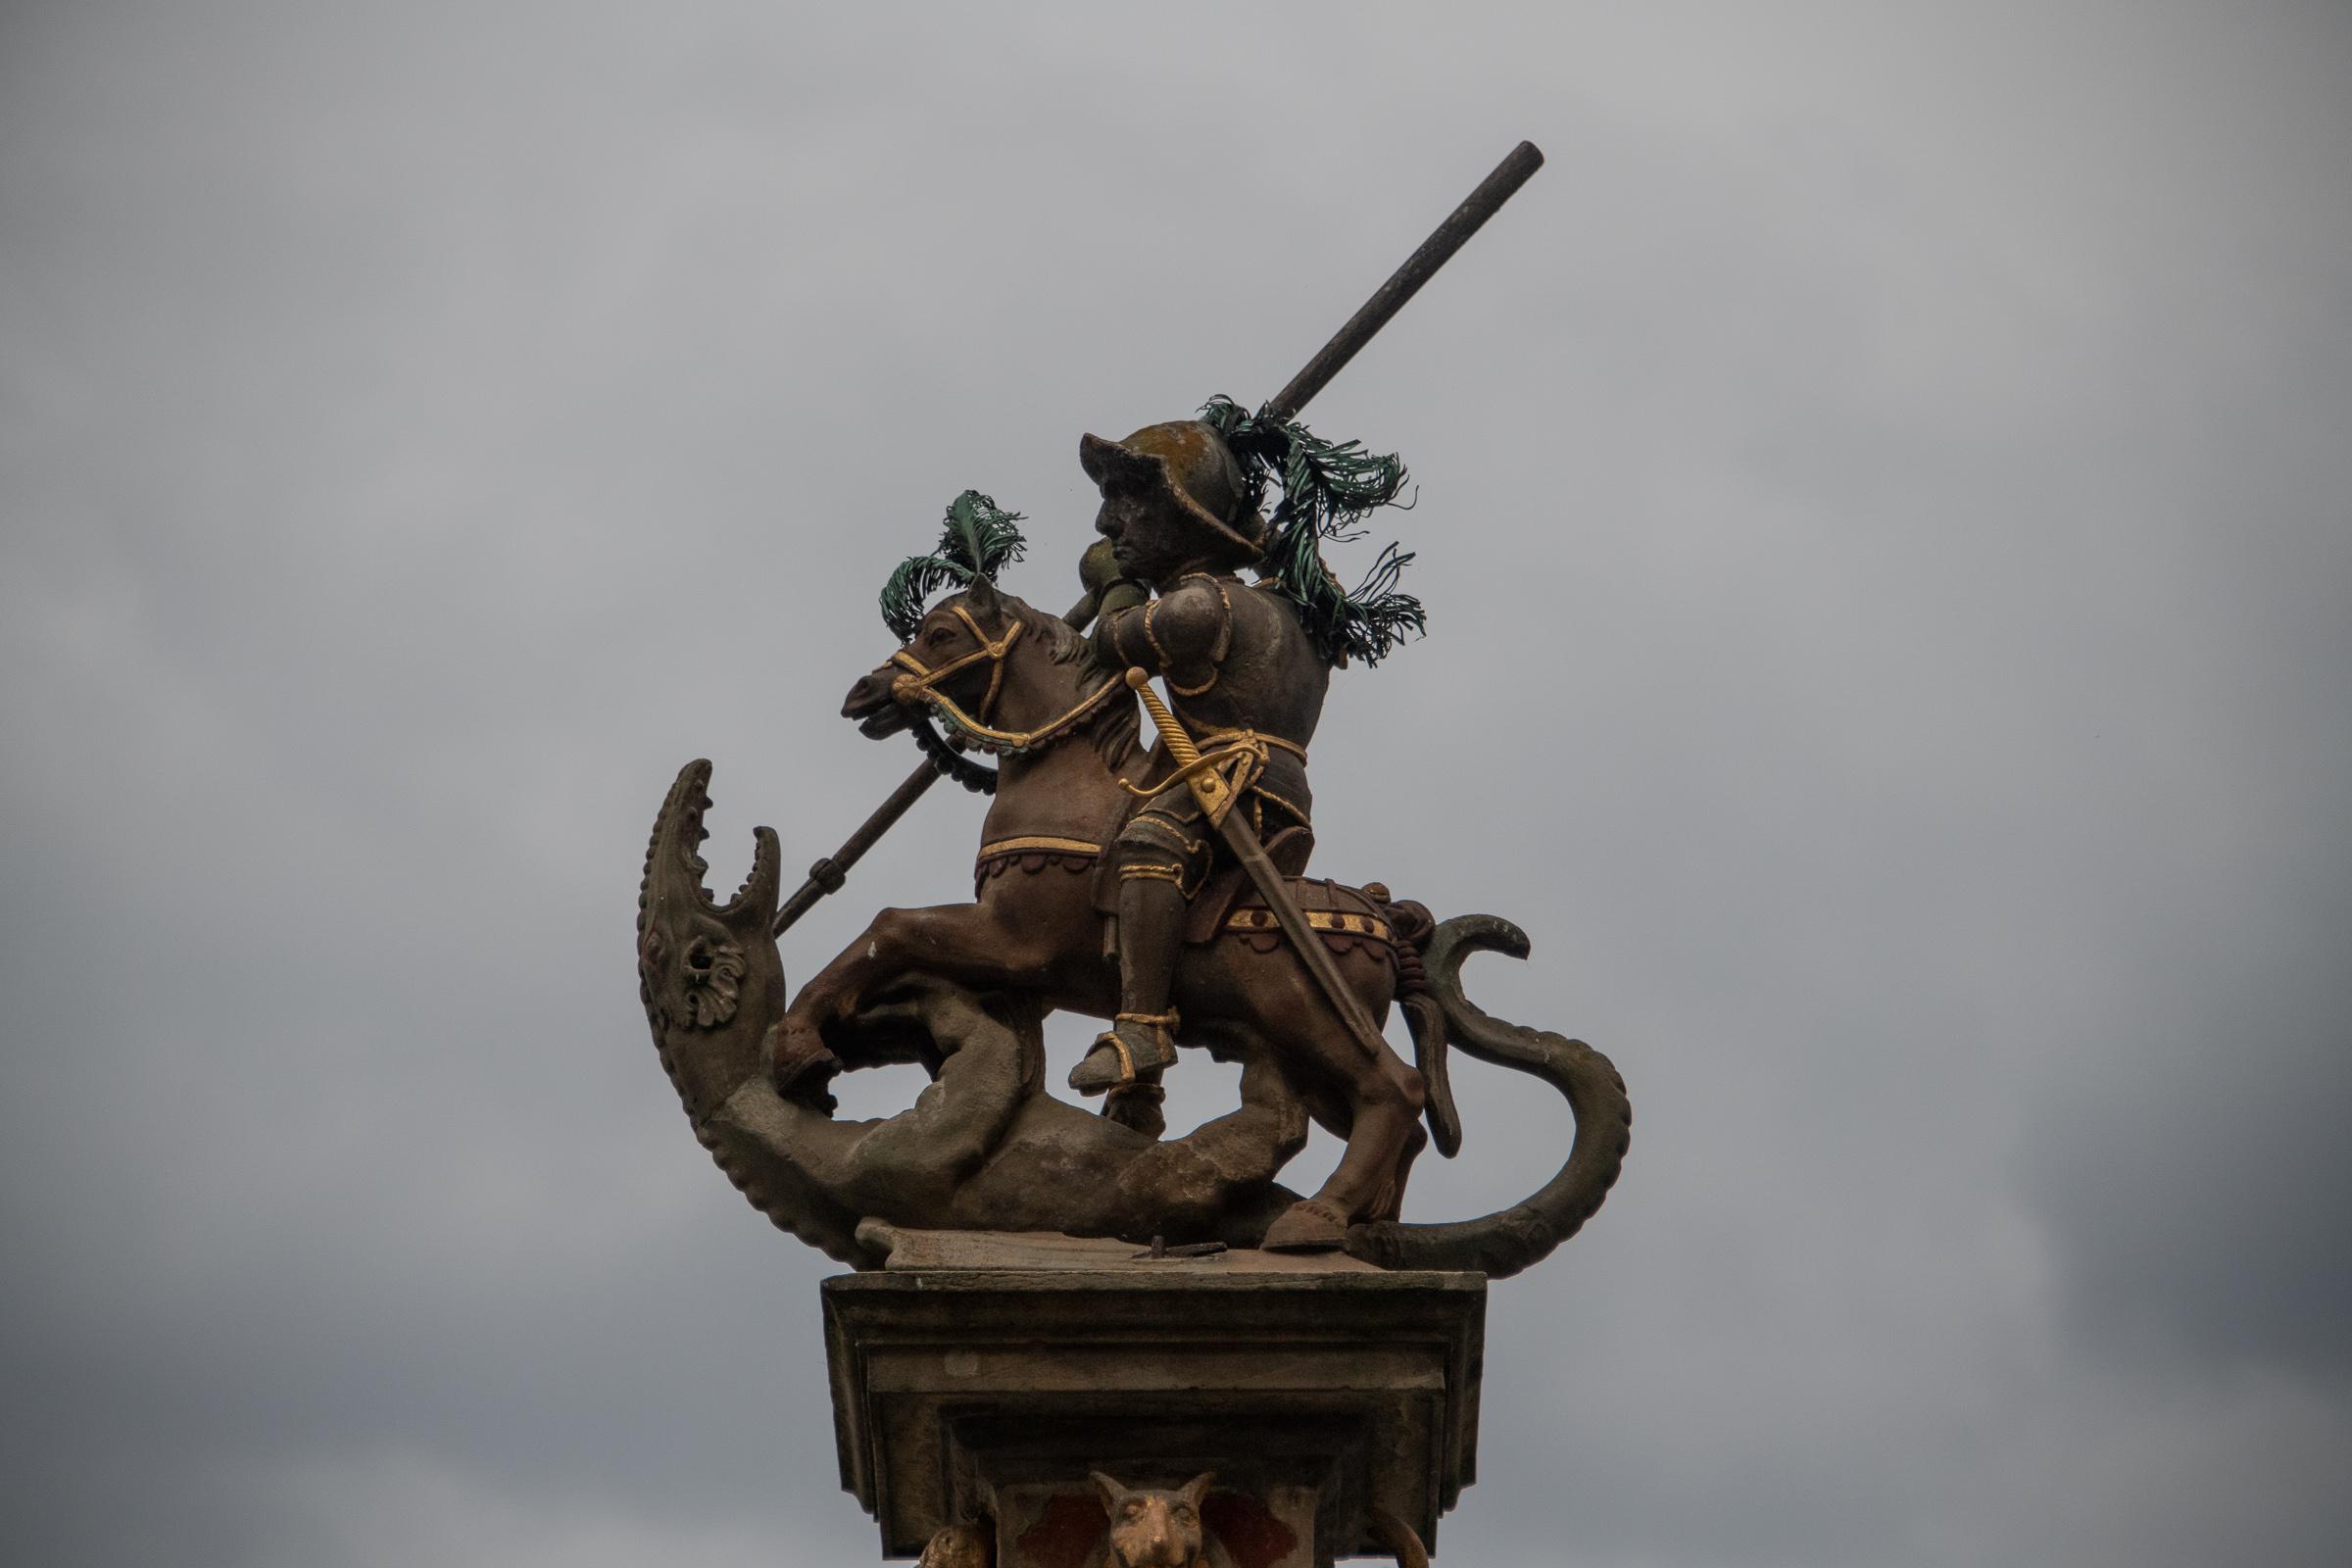 Georgsbrunnen statue